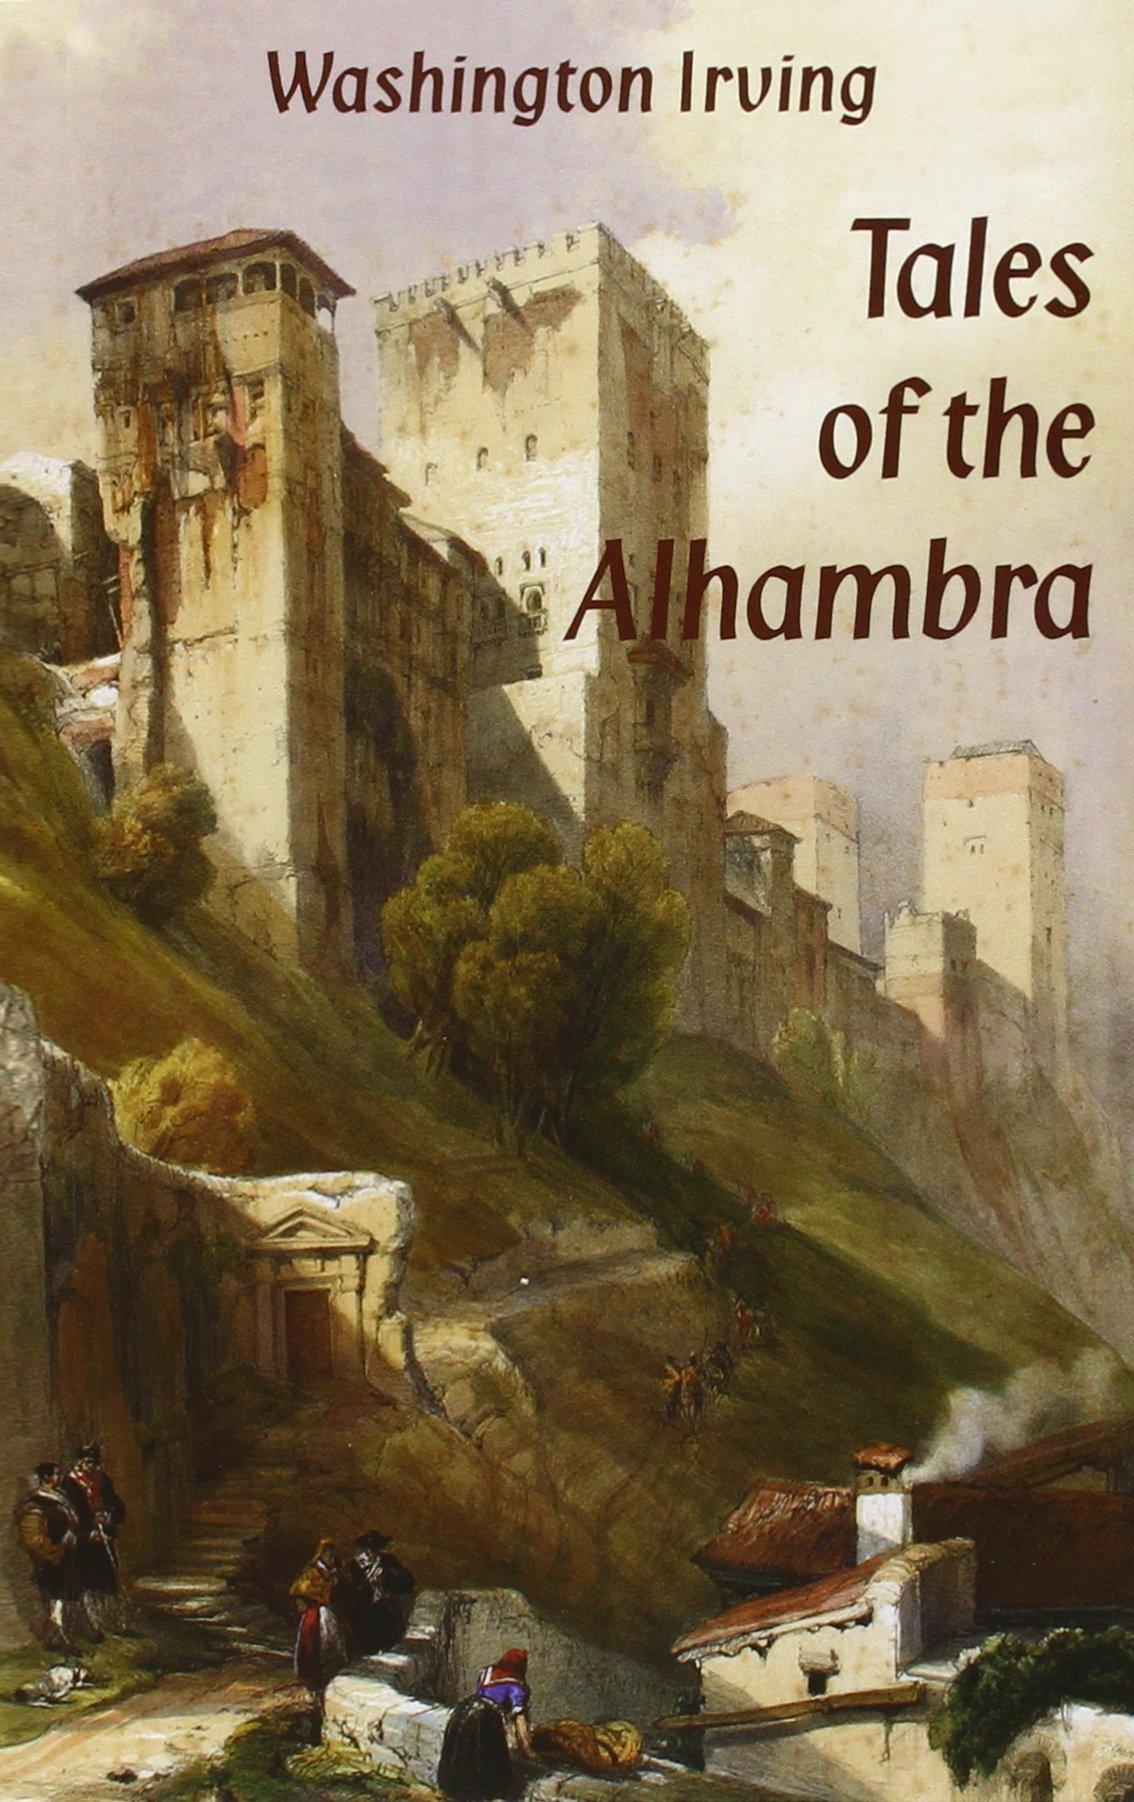 Tales of the Alhambra: washington irving: 9788487282768: Amazon.com: Books